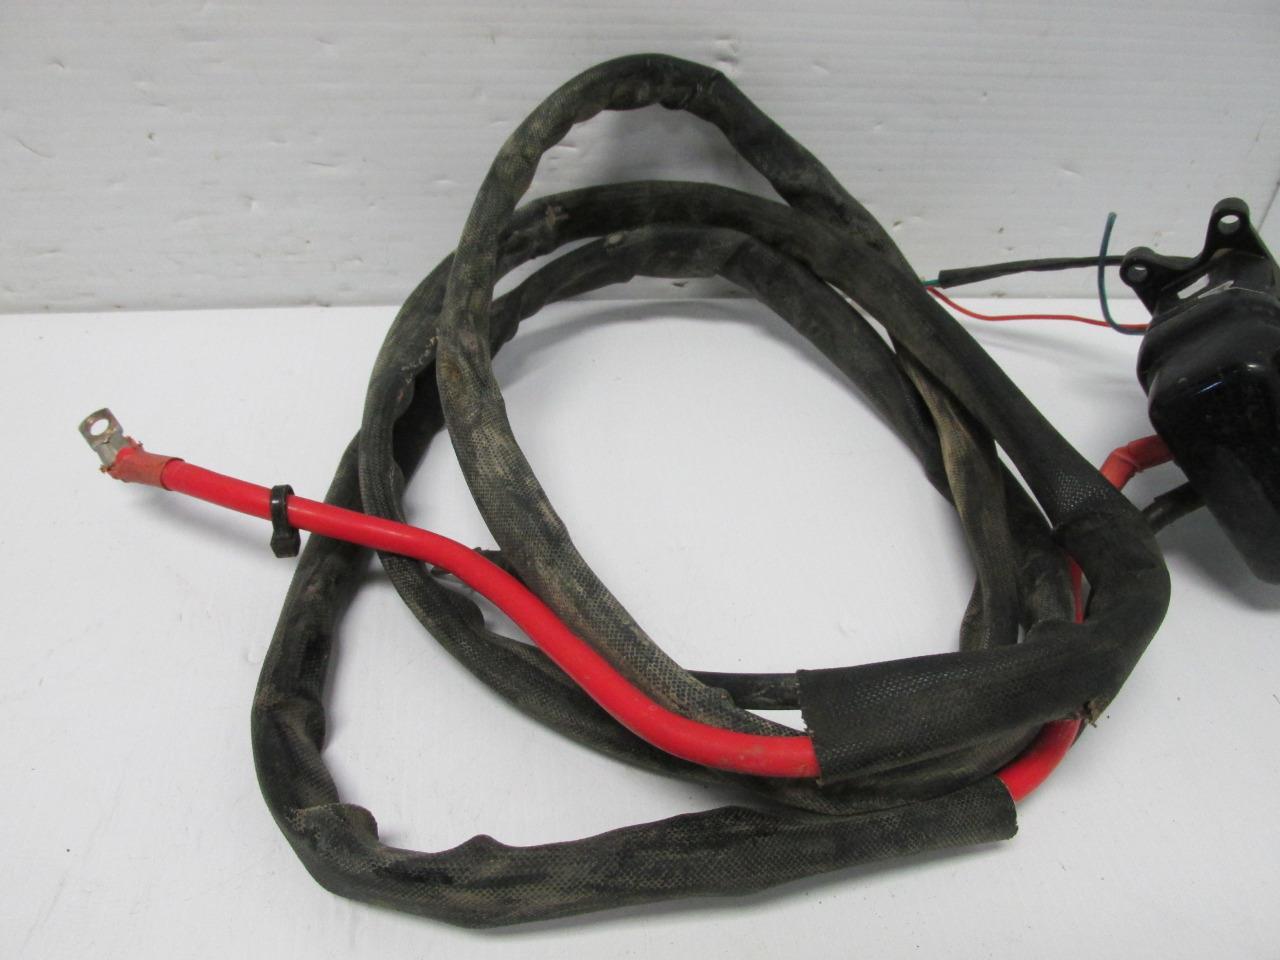 hight resolution of cfmoto cf moto snyper utv lbs champion winch wires cfmoto cf moto snyper 600 utv 2014